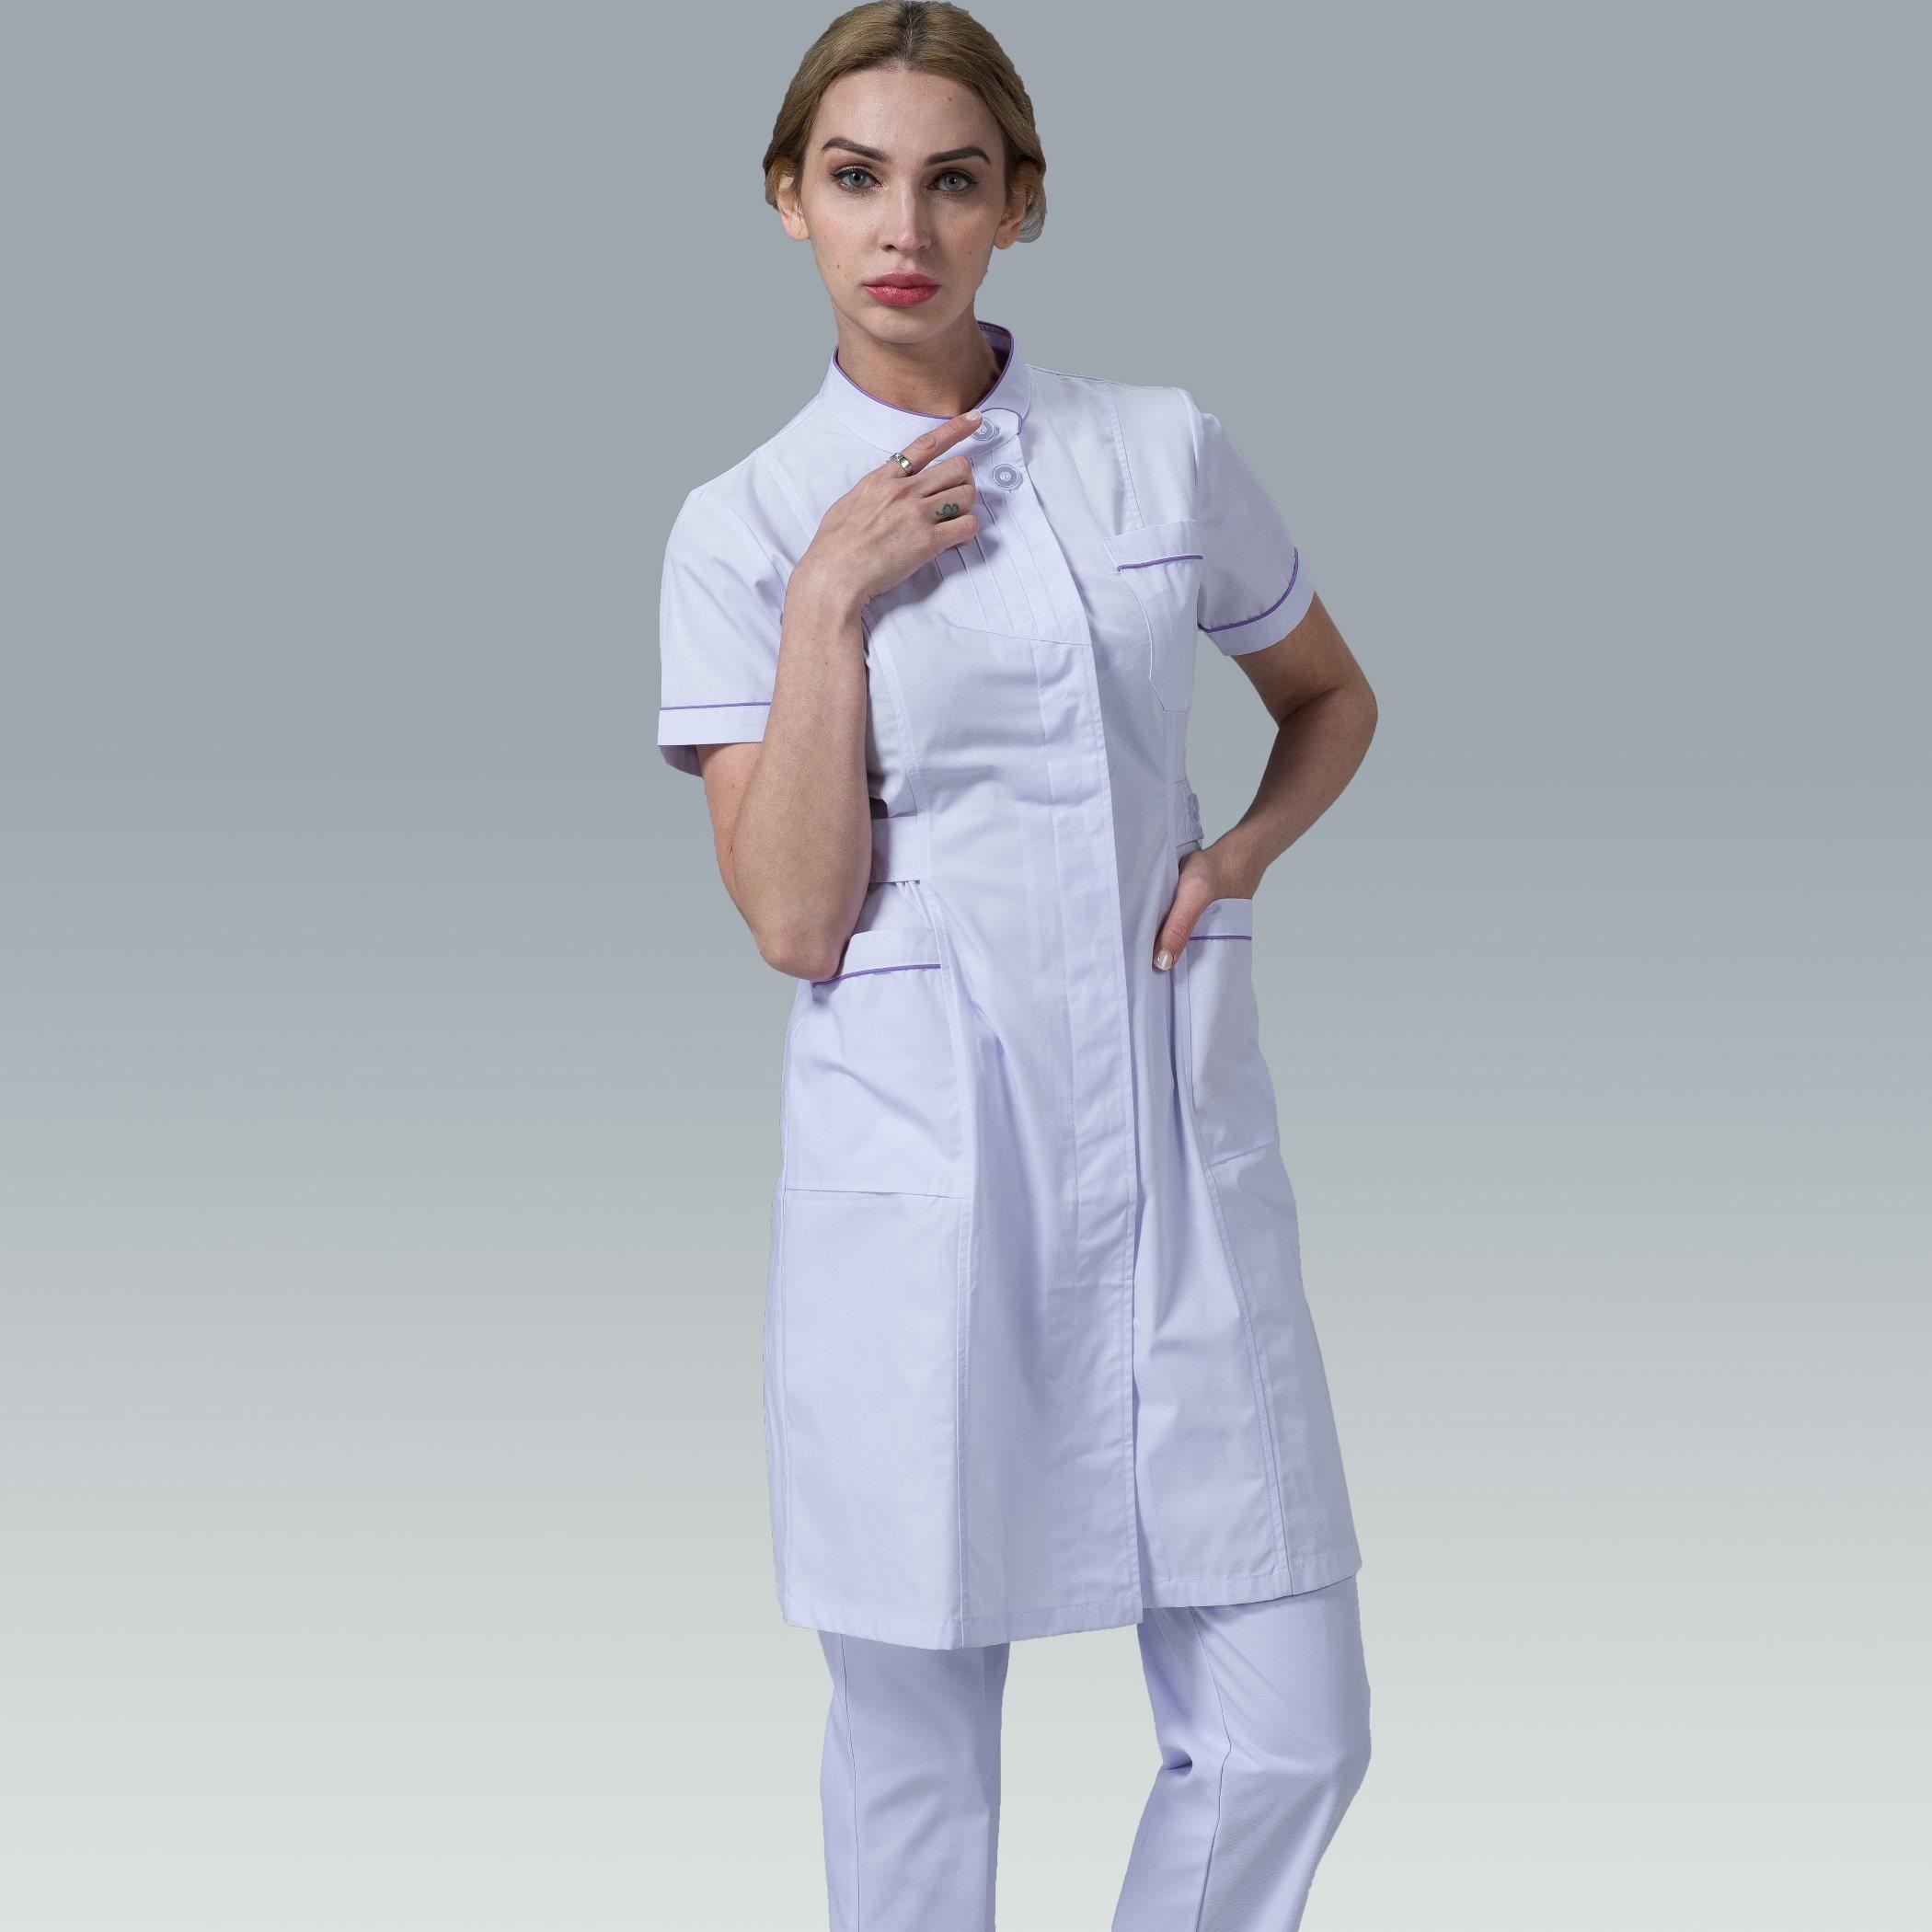 b66c30f1115 [Hot Item] Professional Hospital Uniform Suppliers Stand-Collar and Border  Nurse Uniform Dress